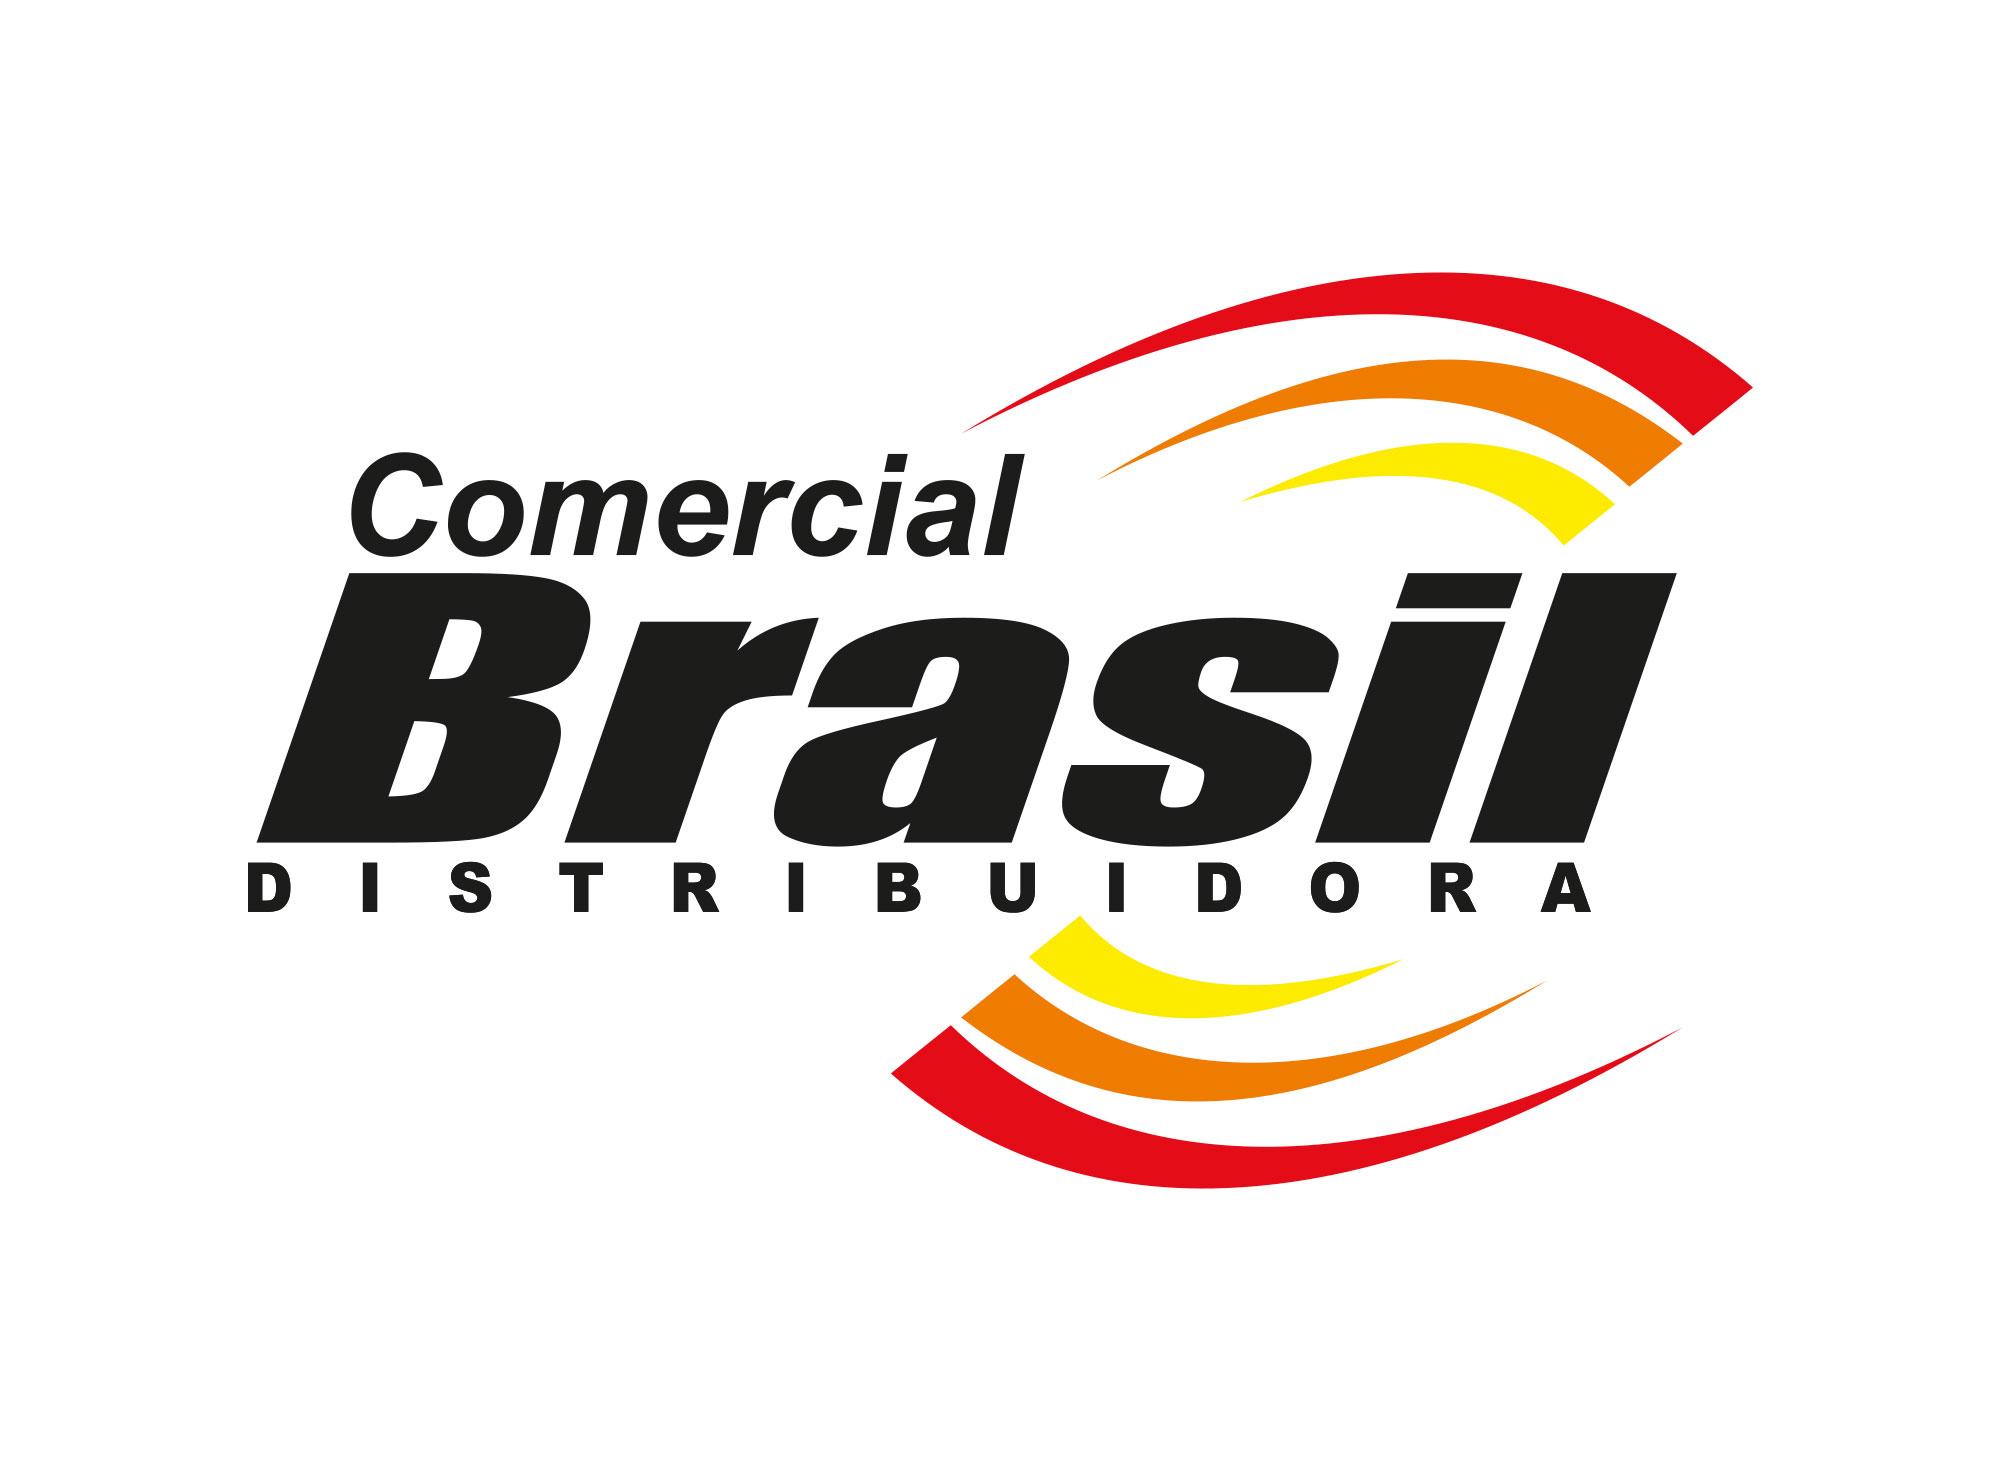 comercial-brasil-distribuidora-cml-clientes-agencia-diretriz-digital-marketing-loja-virtual-fortaleza